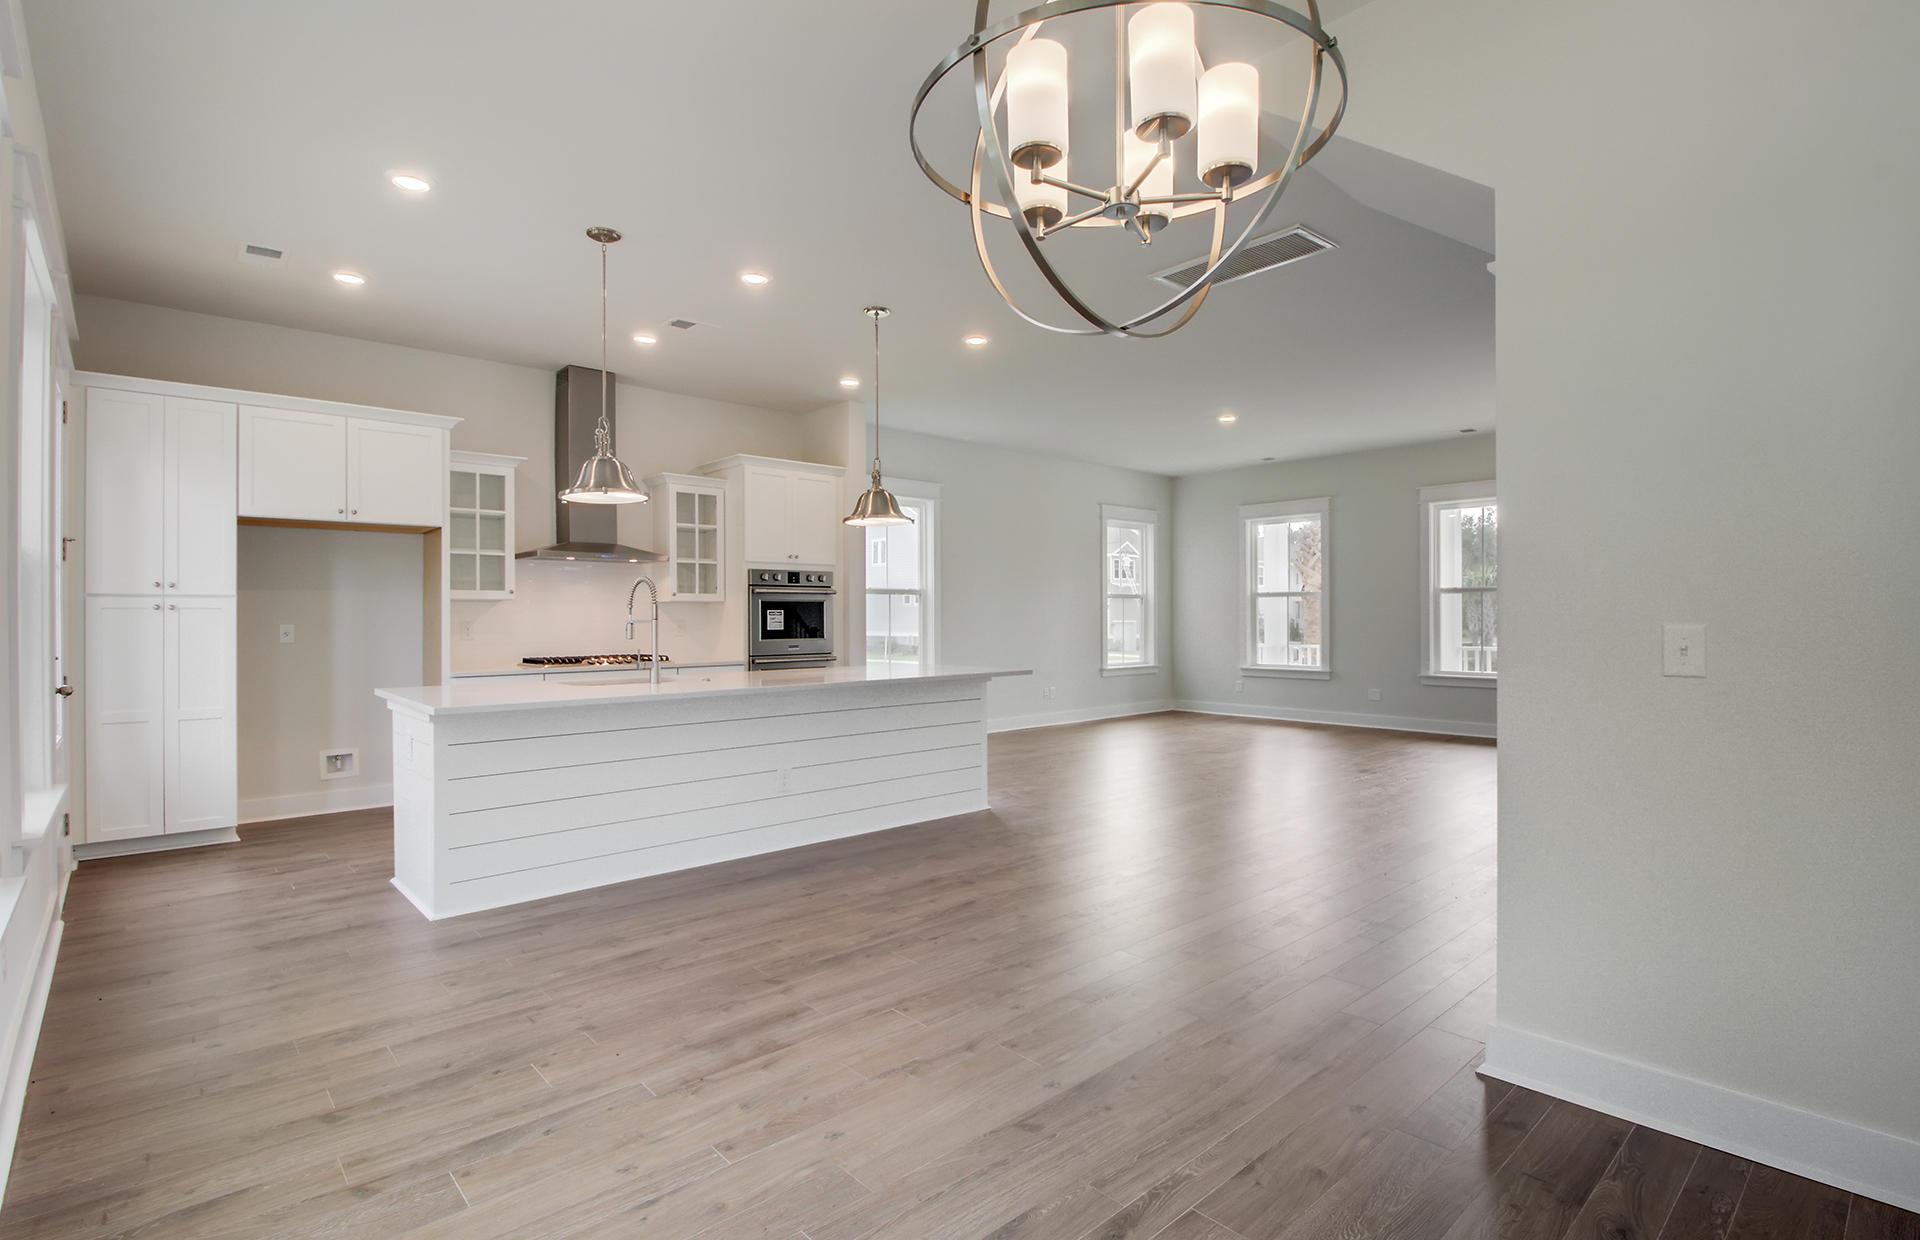 Stonoview Homes For Sale - 2608 Colonel Harrison, Johns Island, SC - 32